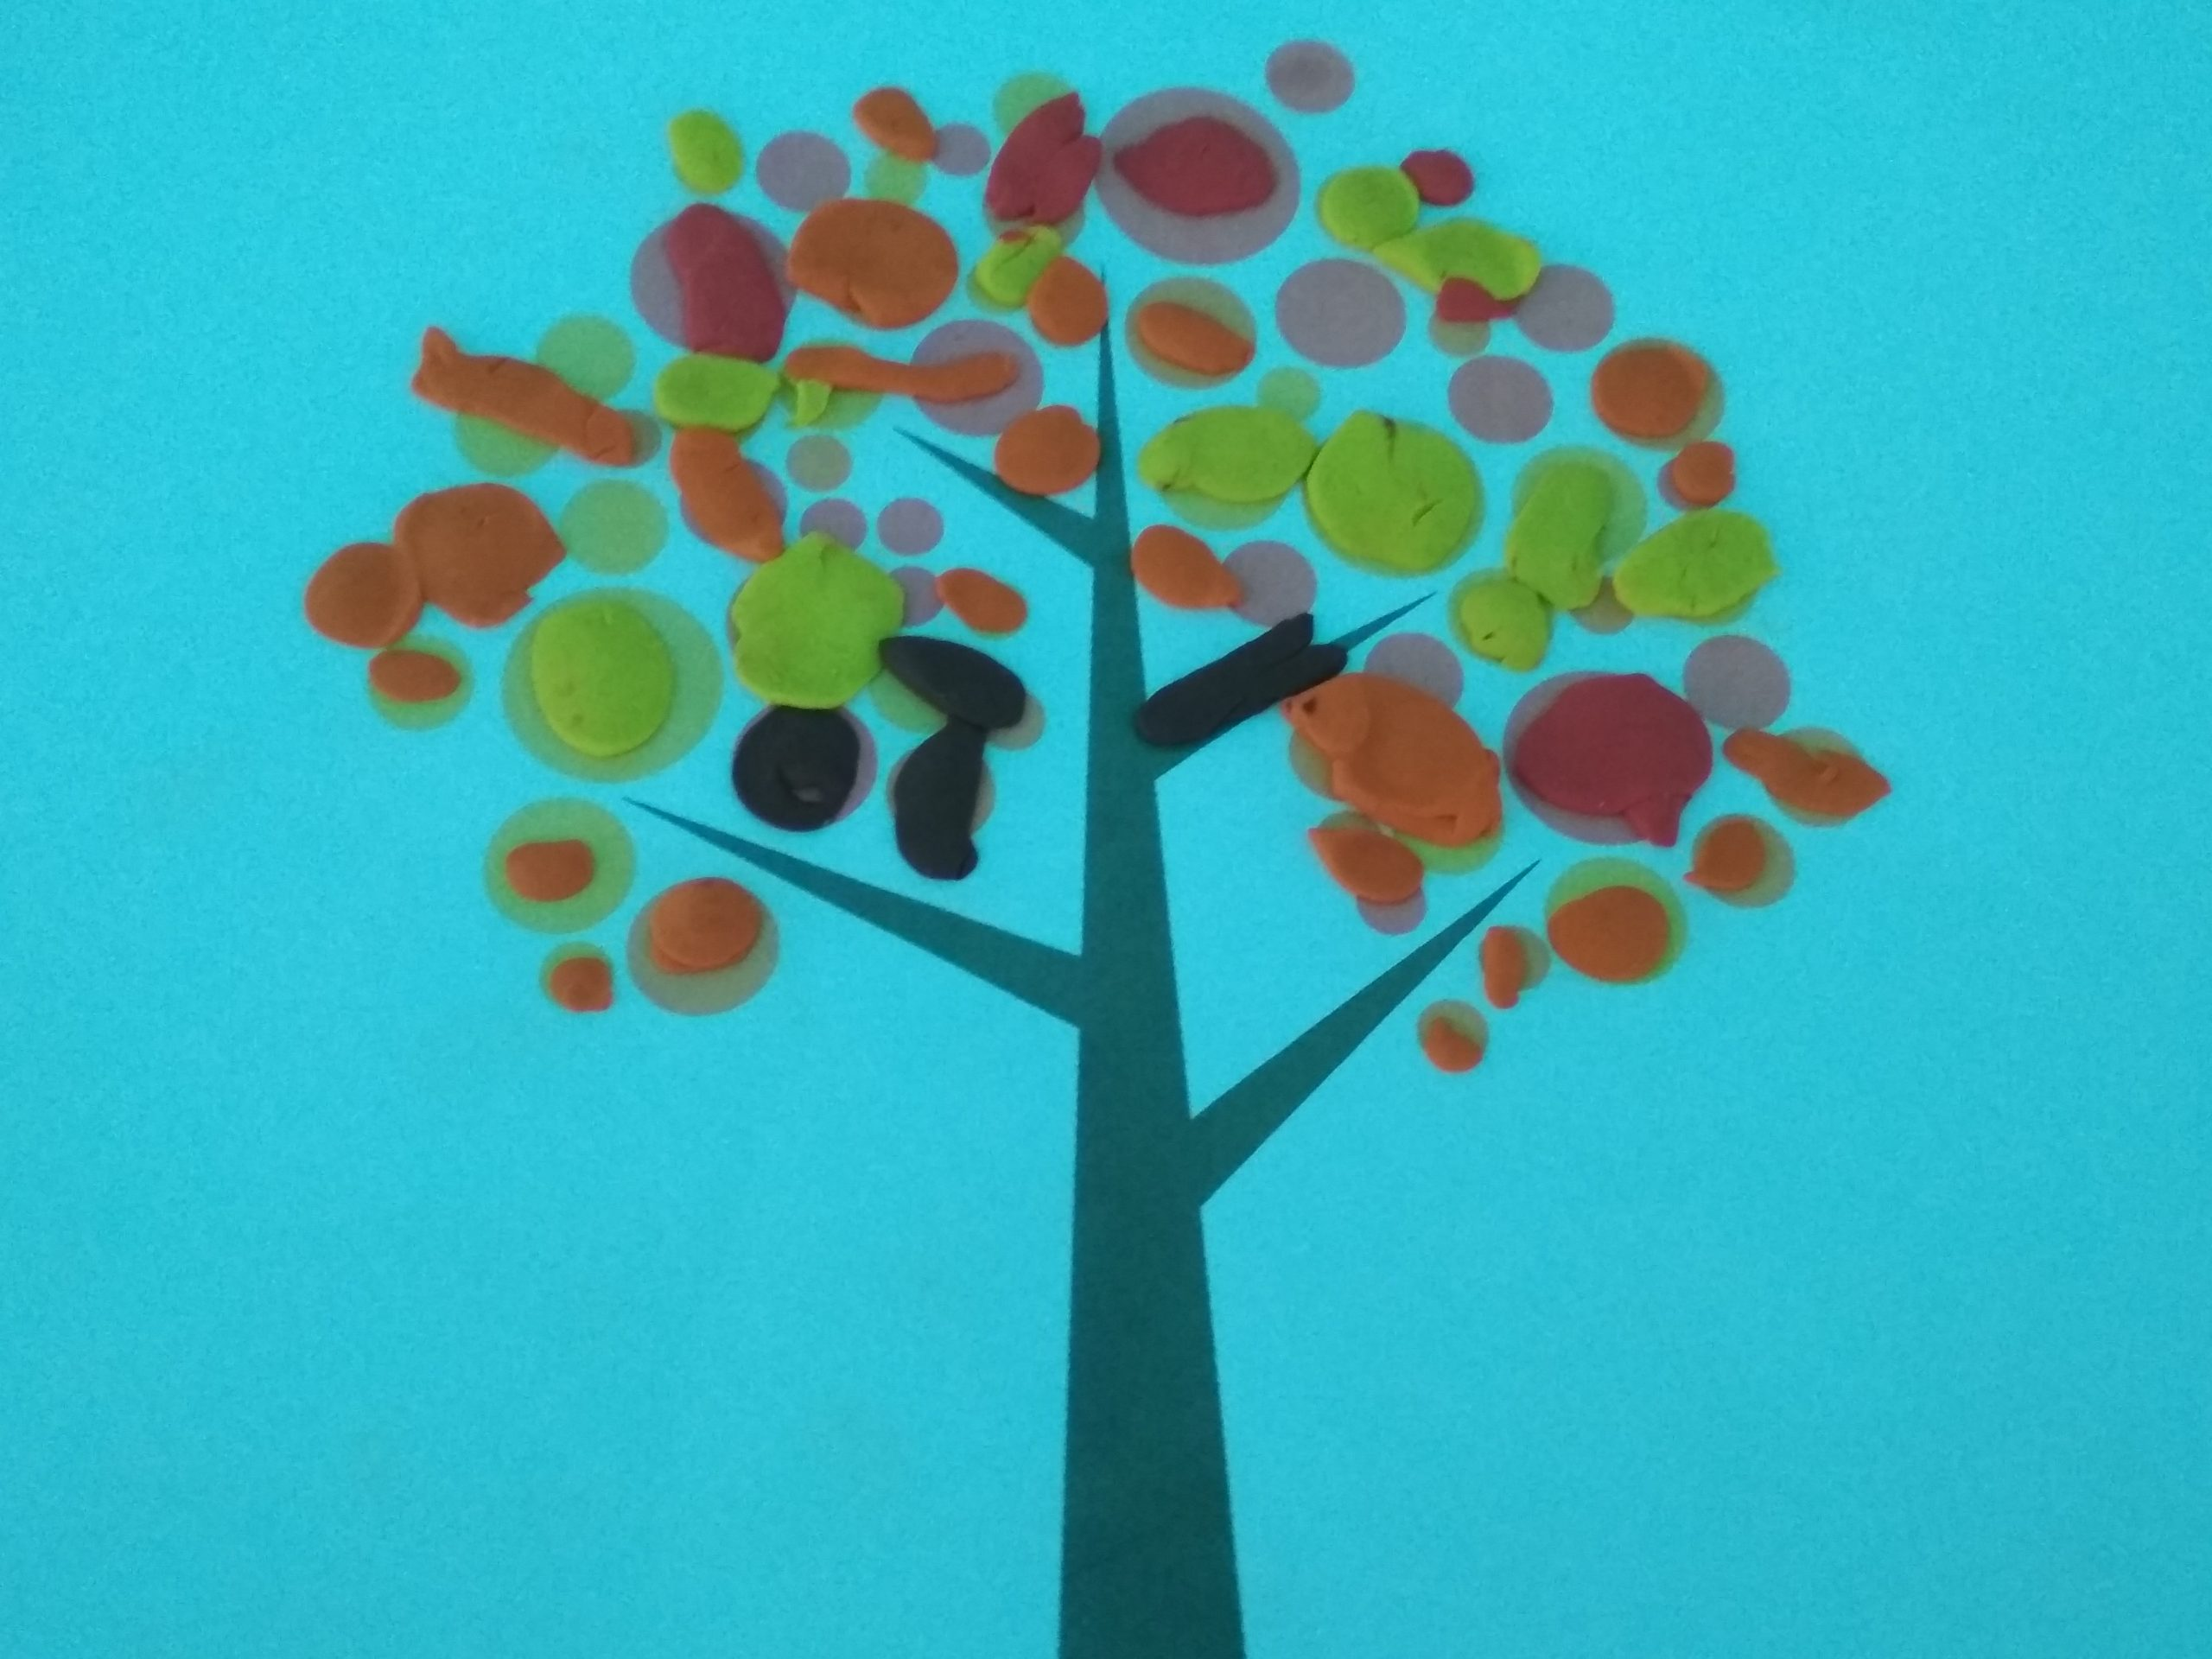 Jesienne drzewa 23.09.2021